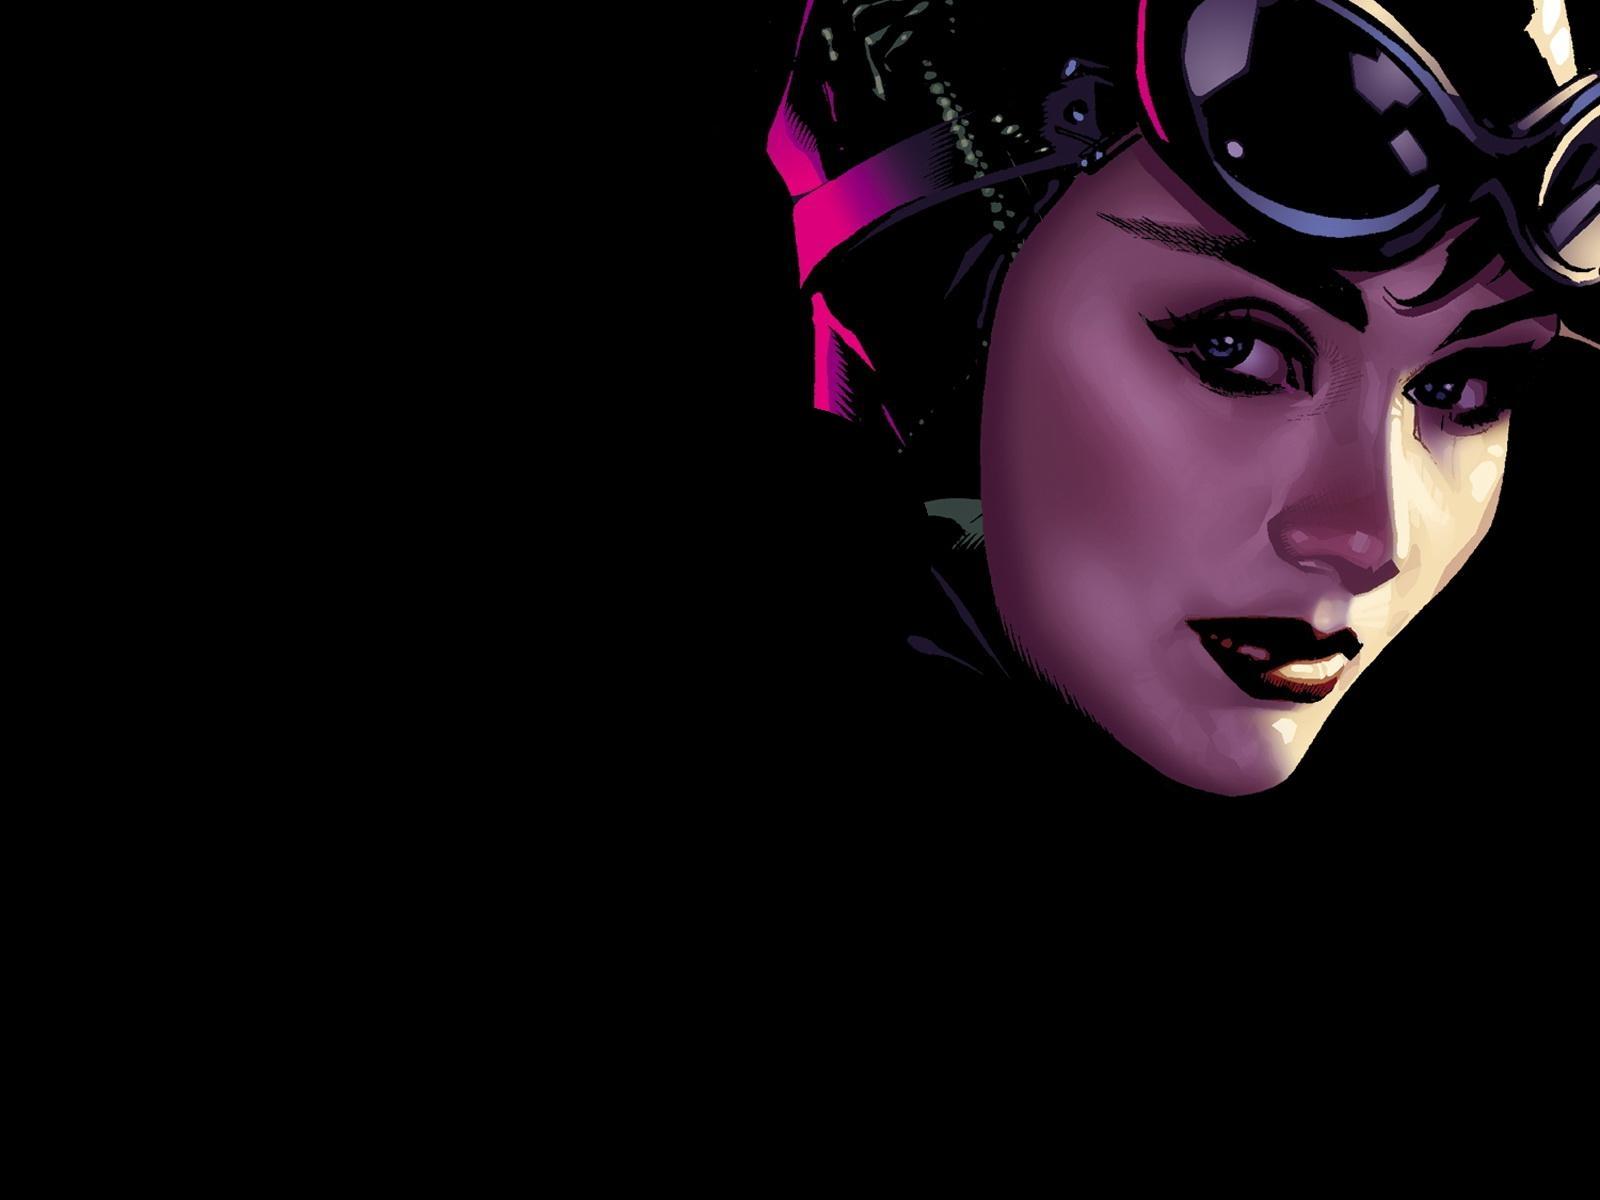 Catwoman Computer Wallpapers Desktop Backgrounds 1600x1200